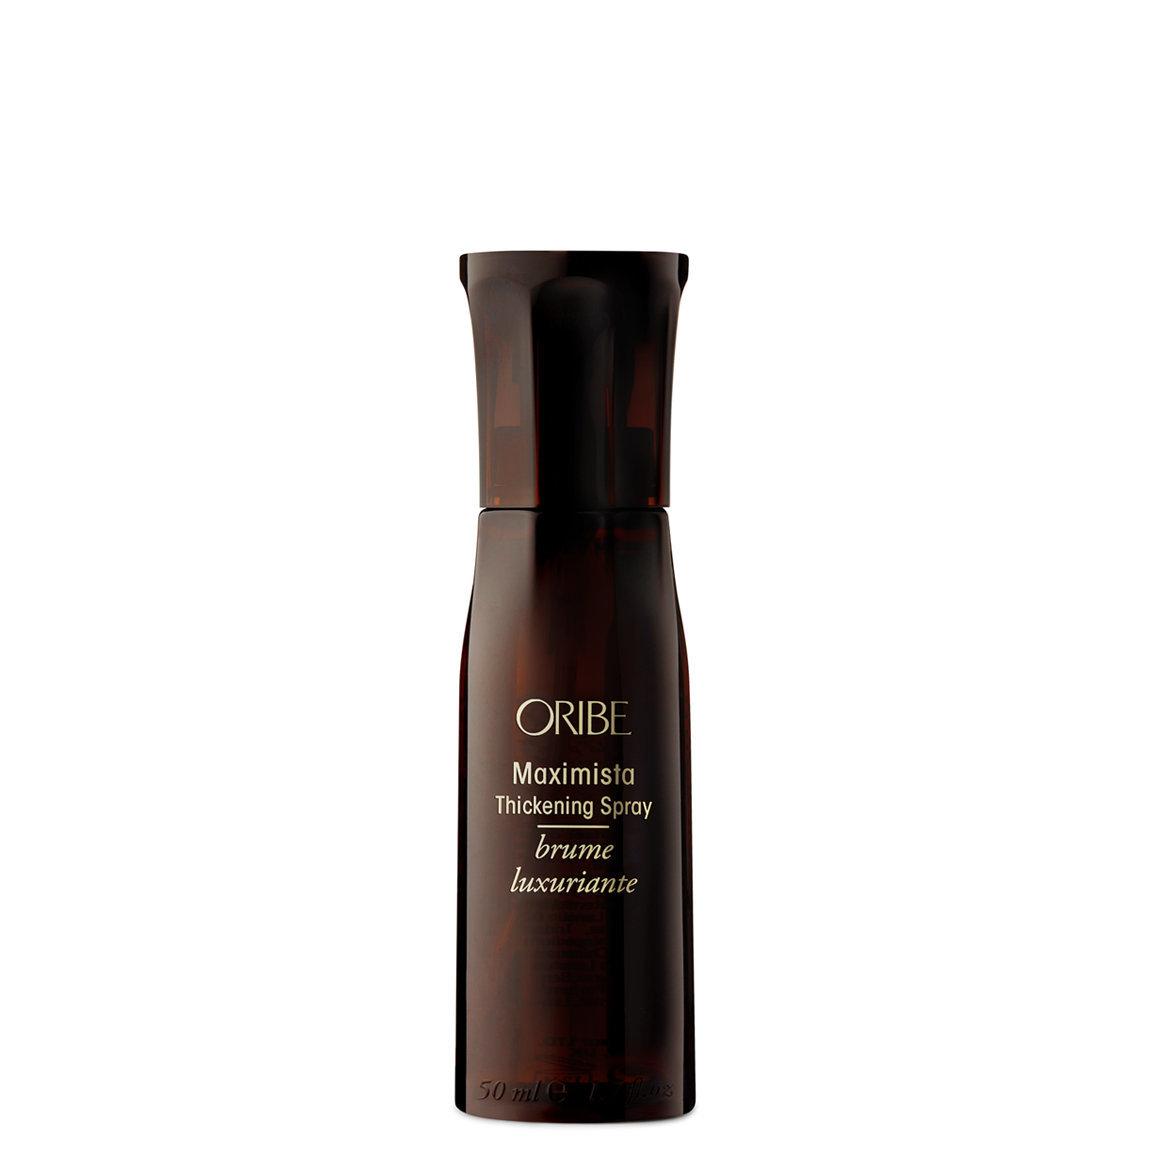 Oribe Maximista Thickening Spray 1.7 oz product swatch.